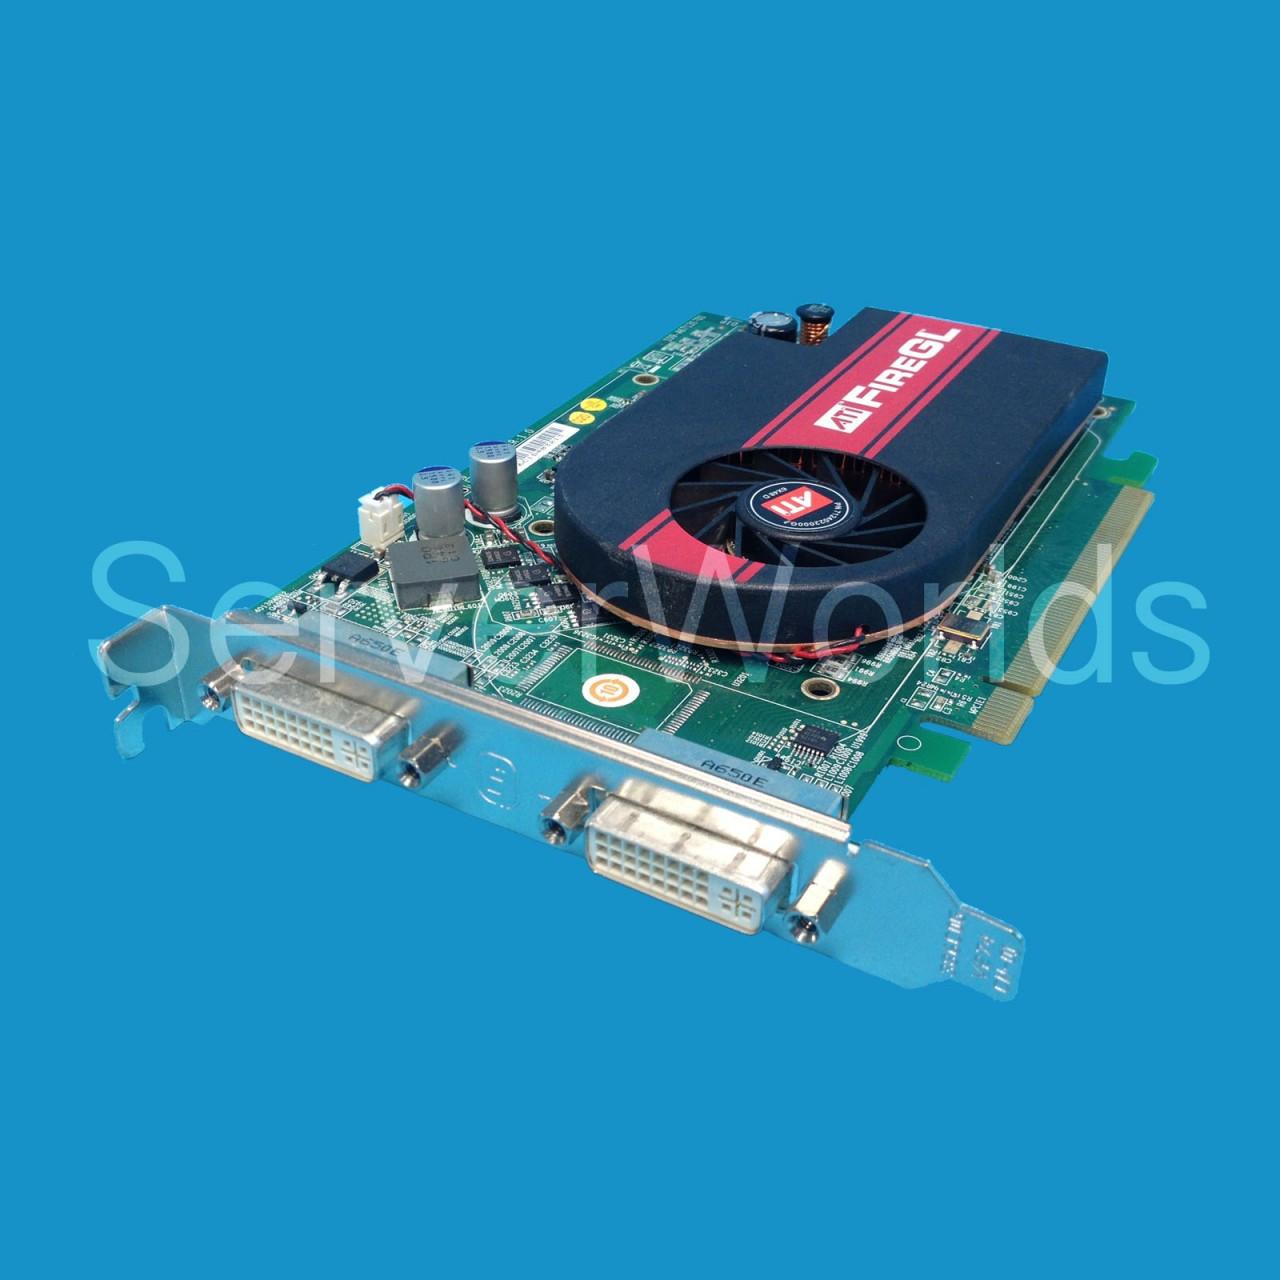 Dell YG666 | ATI V3400 w/128MB PCIe x16 Graphics Card